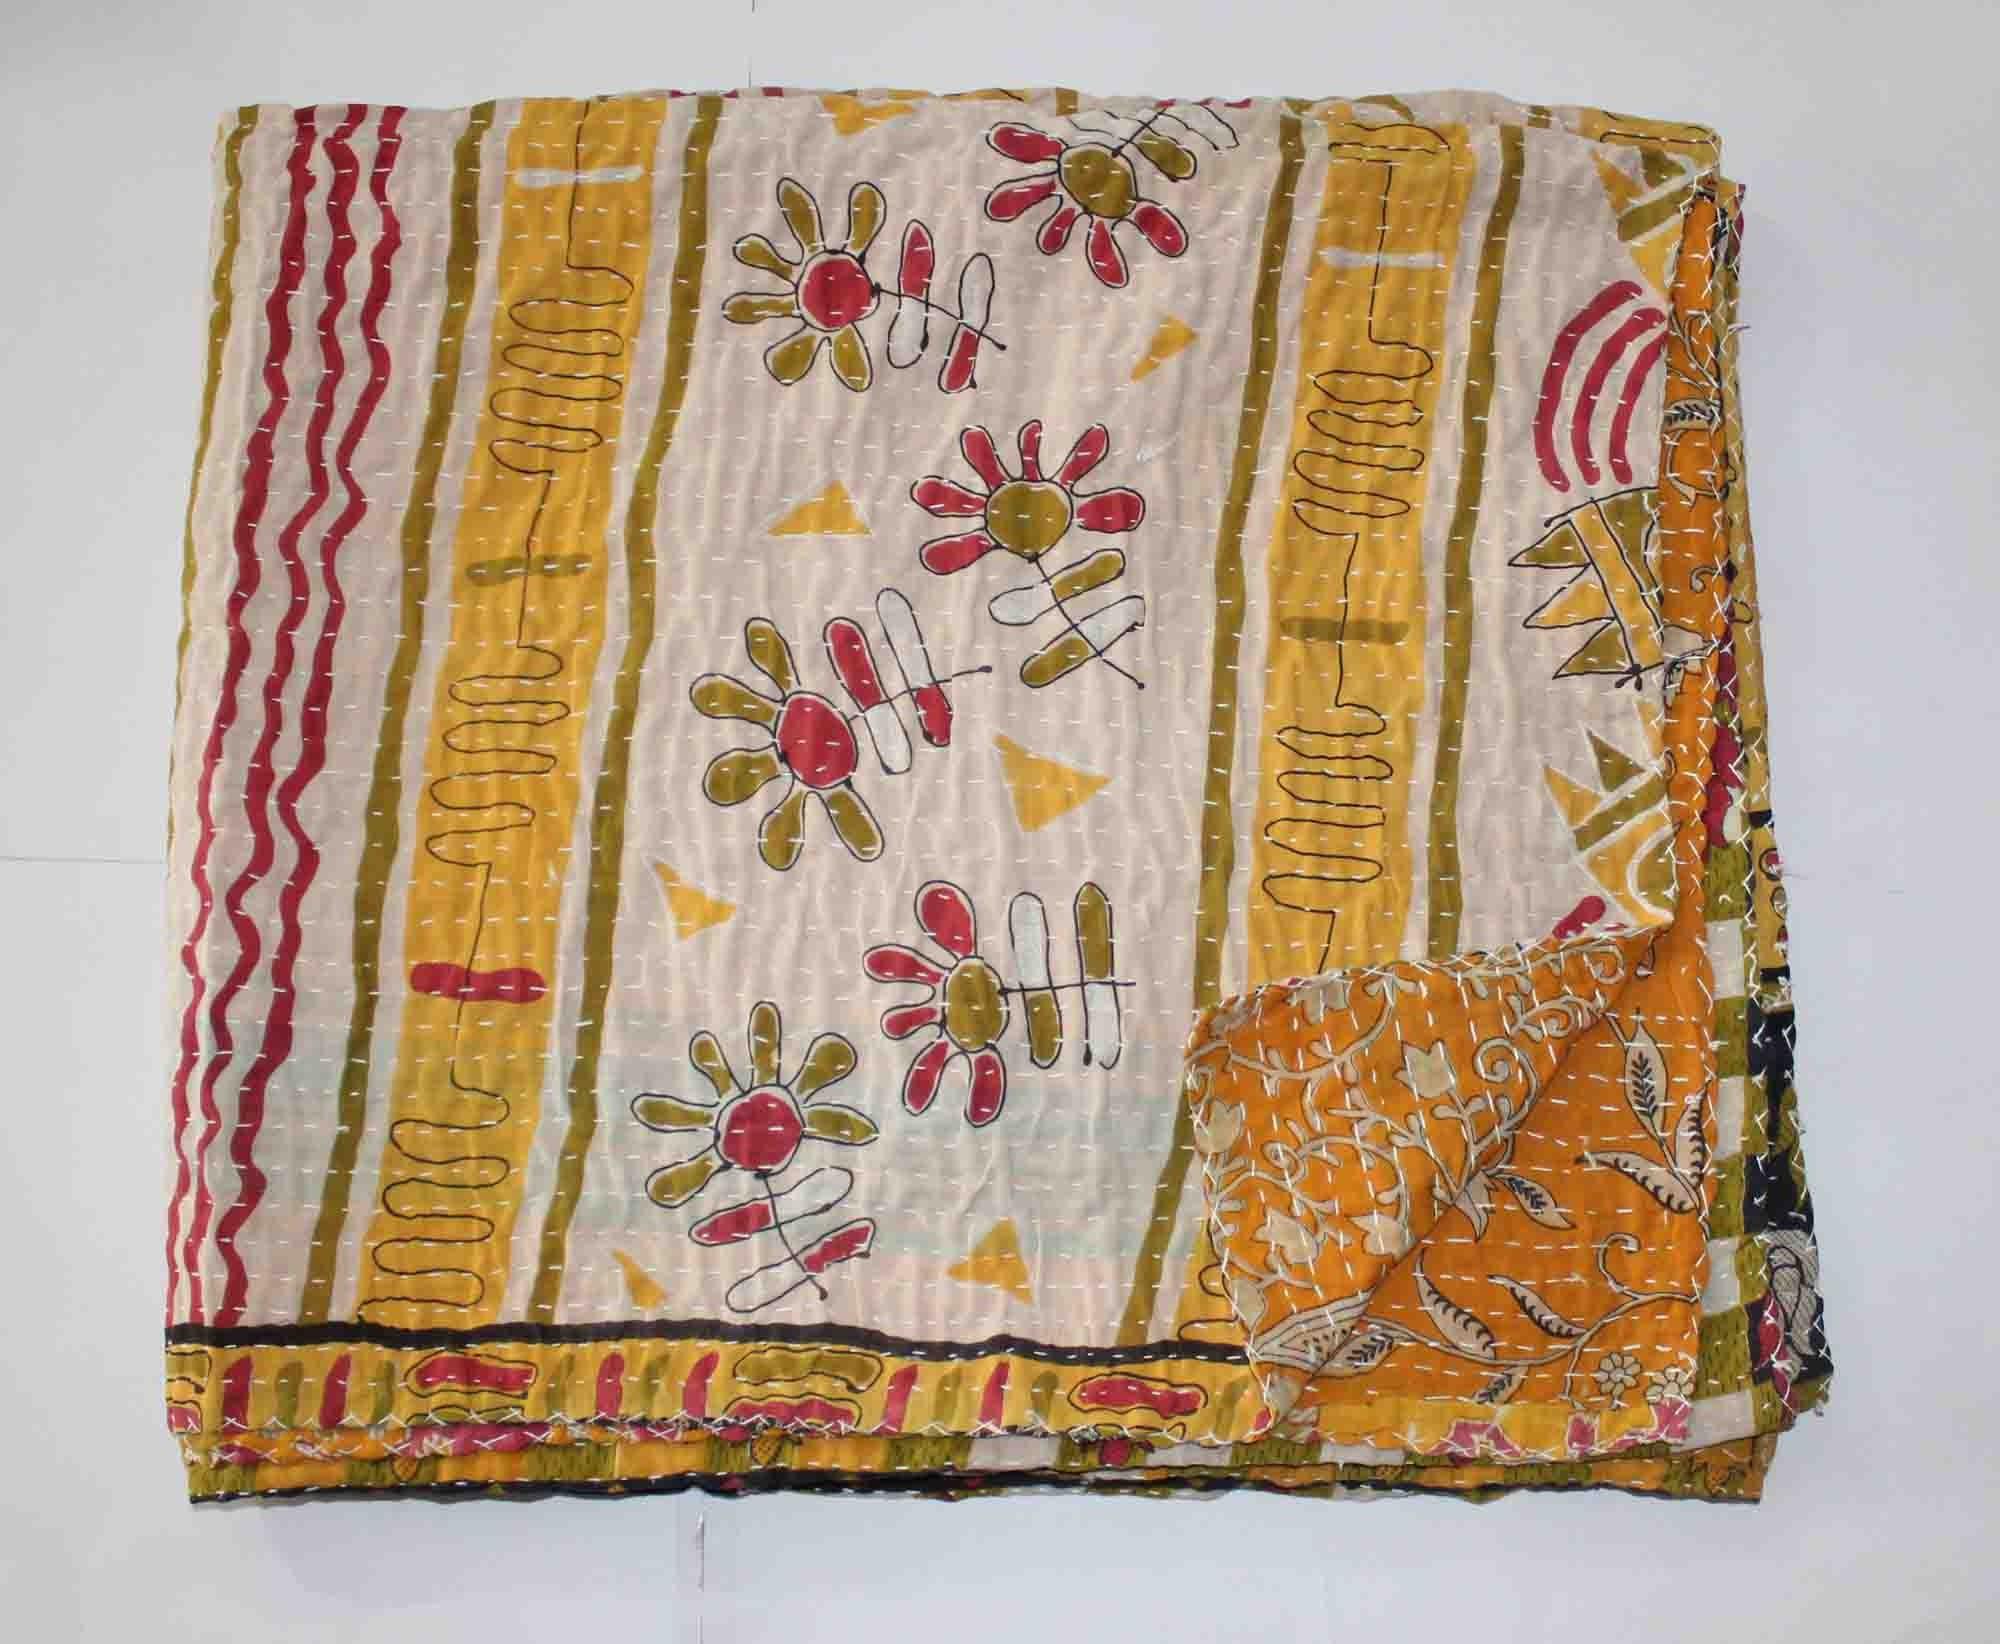 Vintage Patchwork Kantha Bedspread Indian Handmade Quilt Throw Cotton Blanket